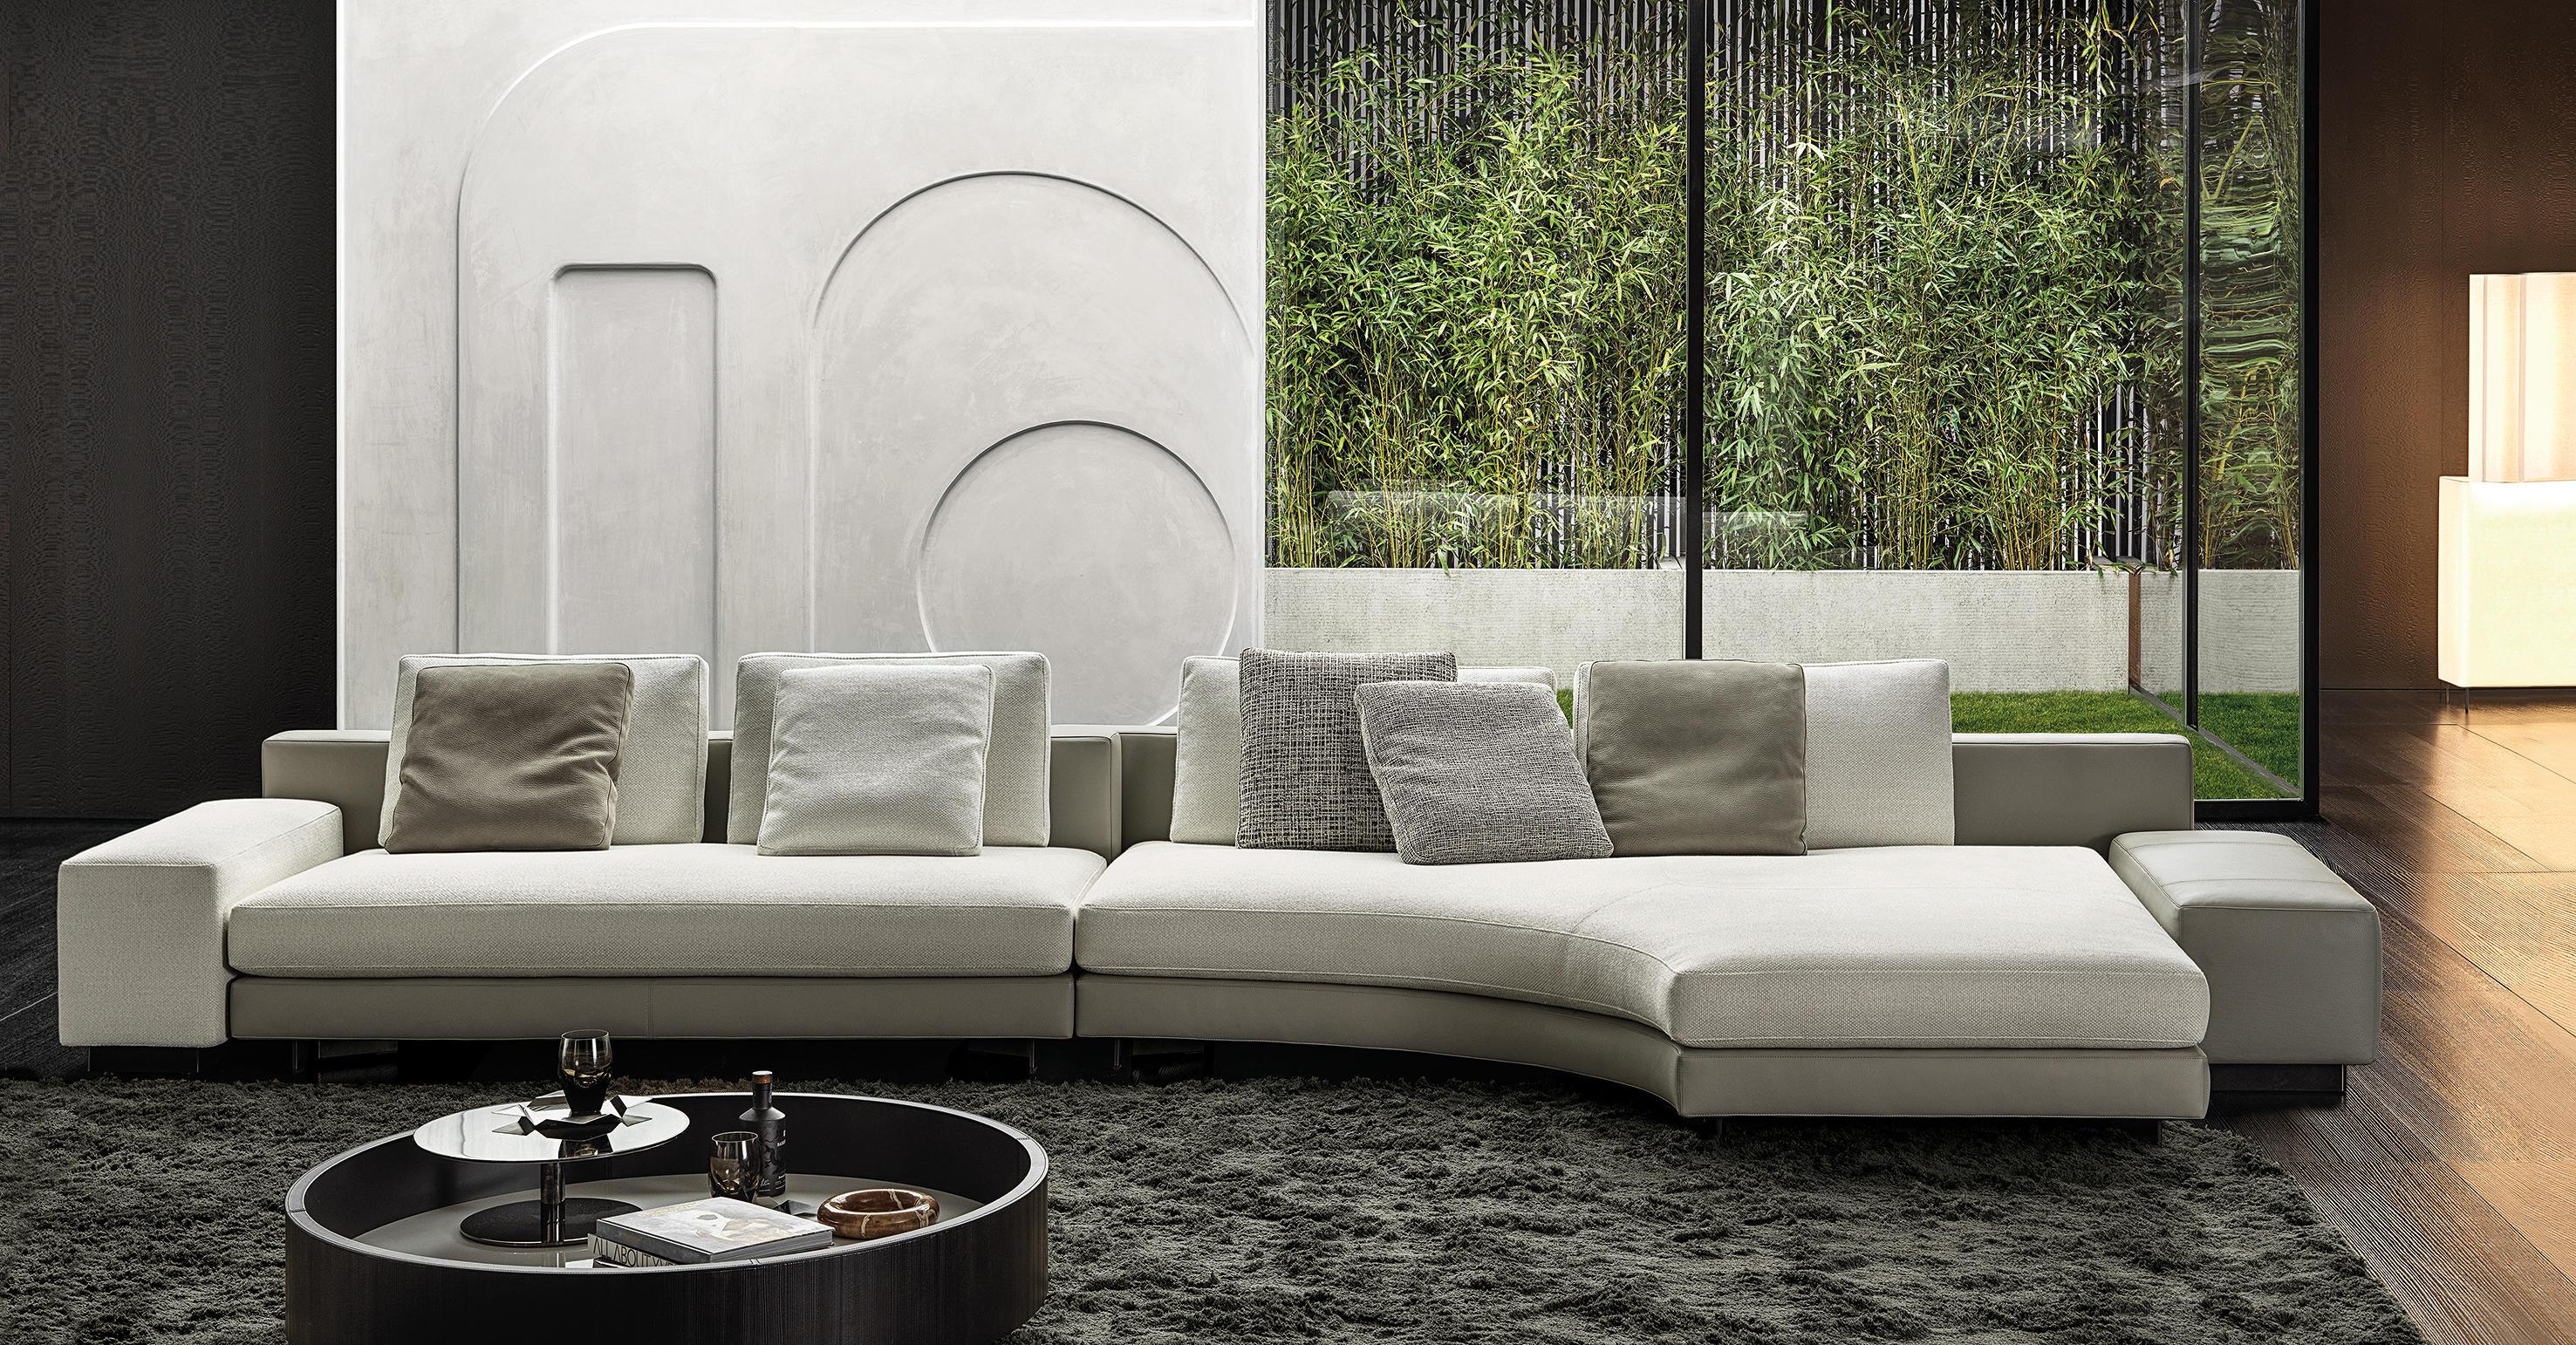 DANIELS - Sofas from Minotti  Architonic